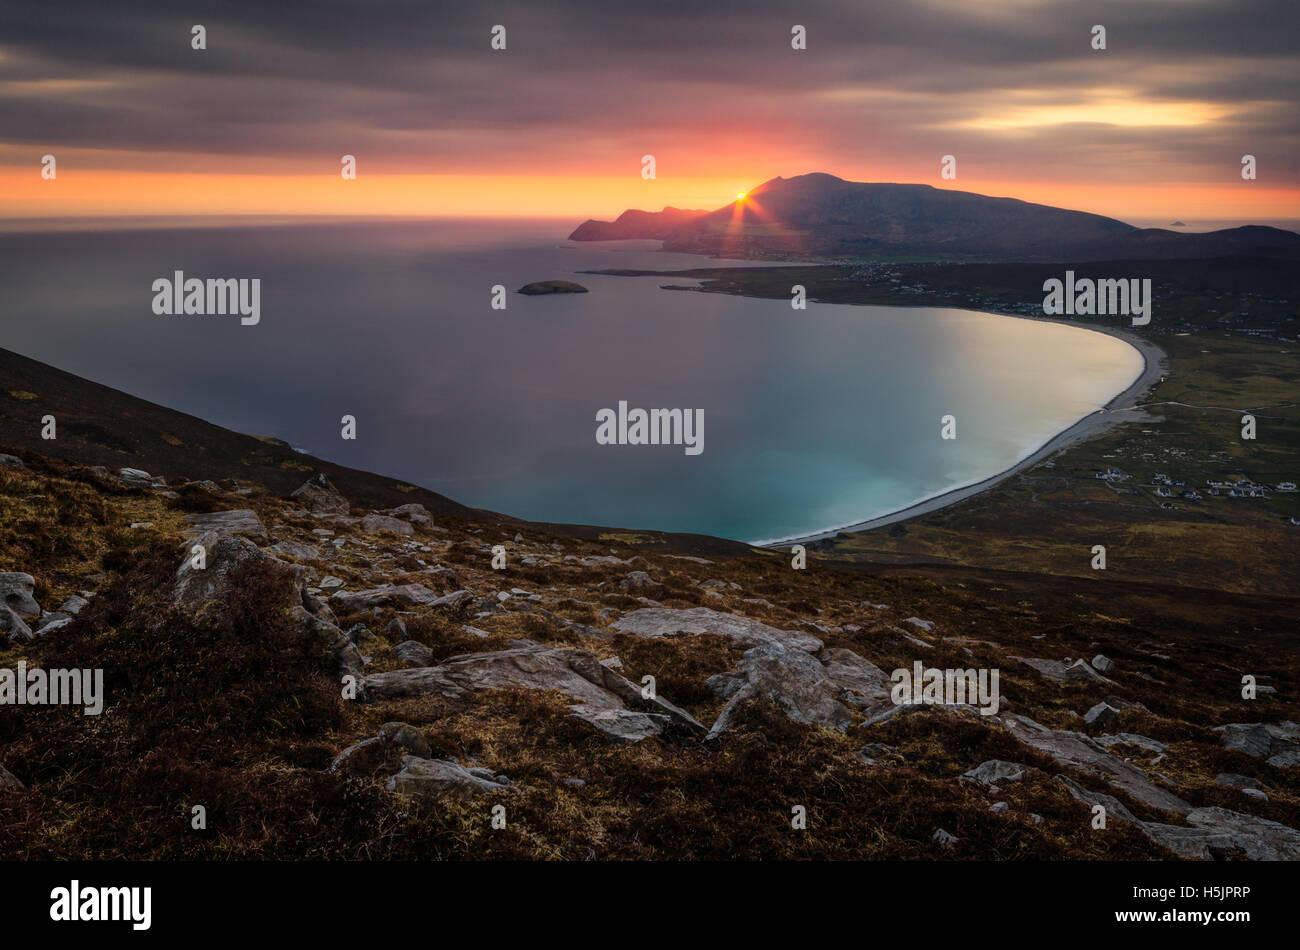 Achill Island sunset in County Mayo, Ireland. - Stock Image